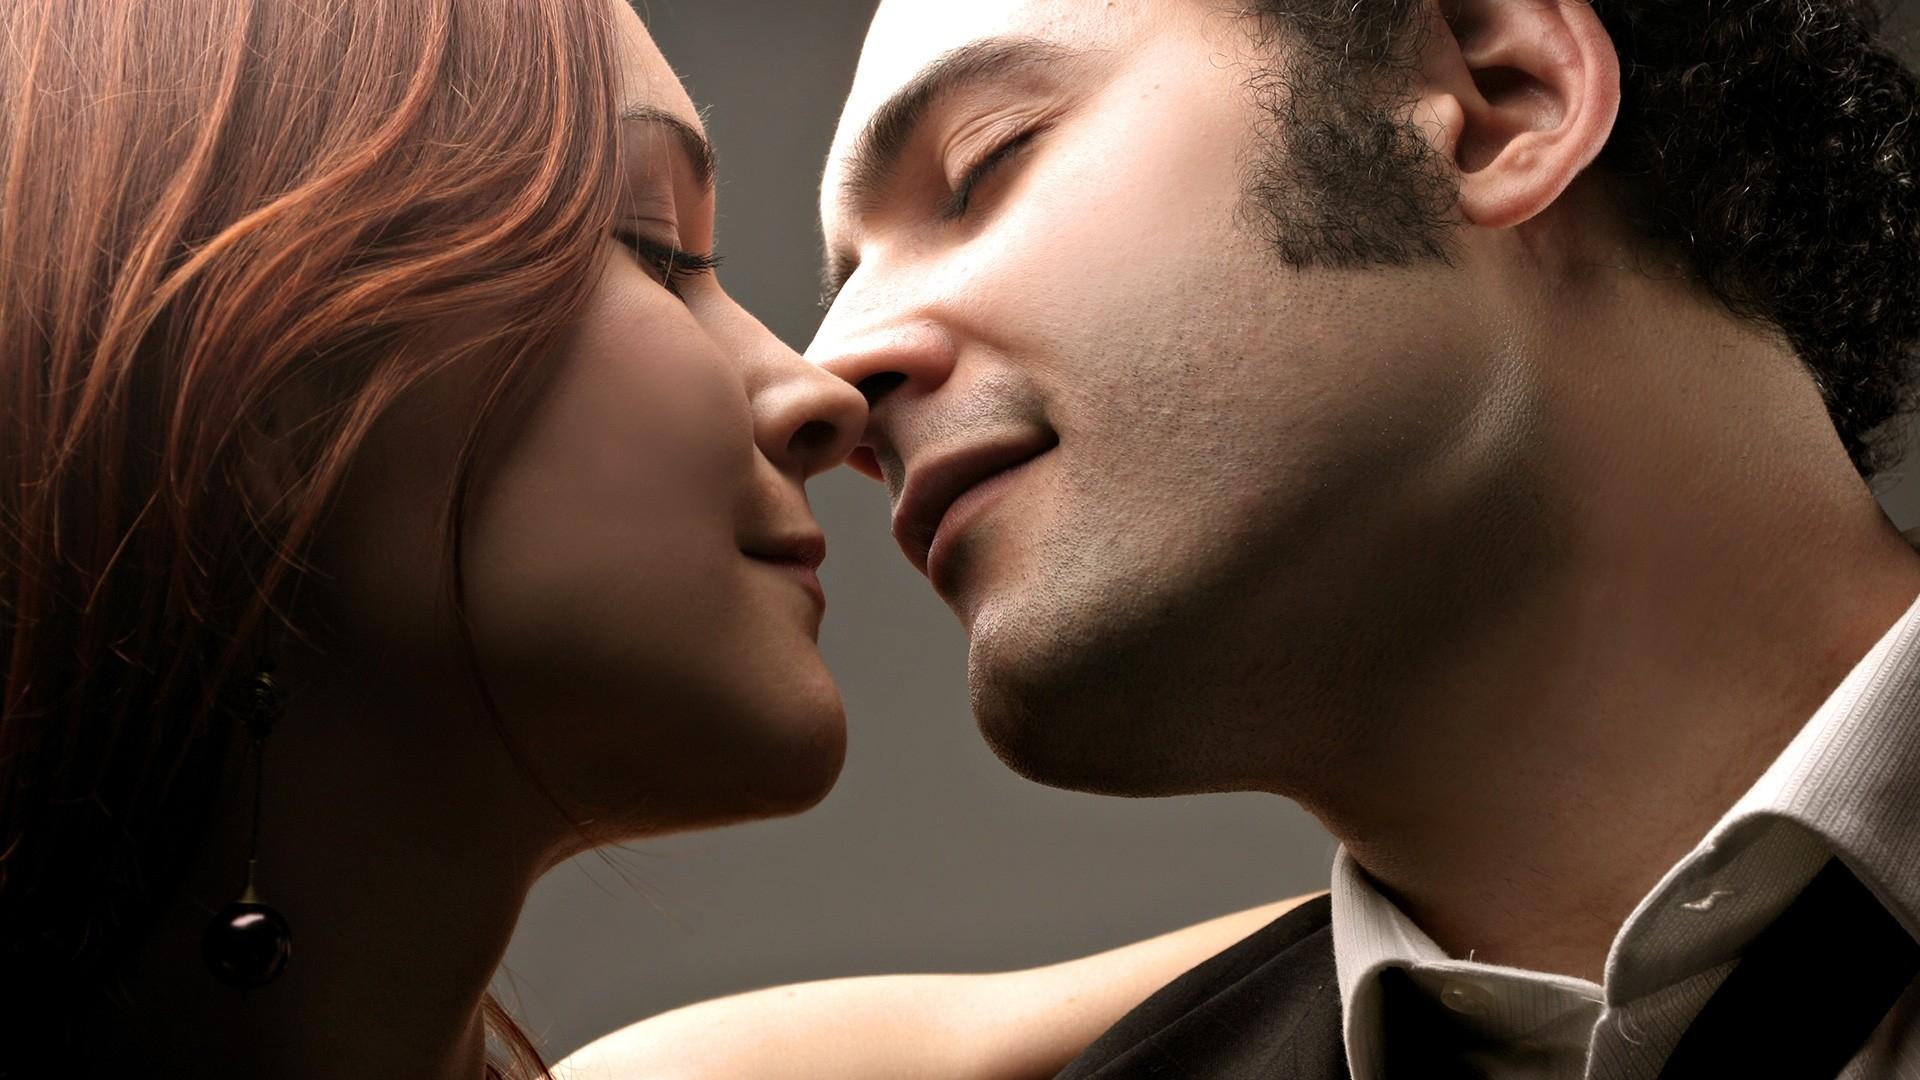 Image kissing man woman